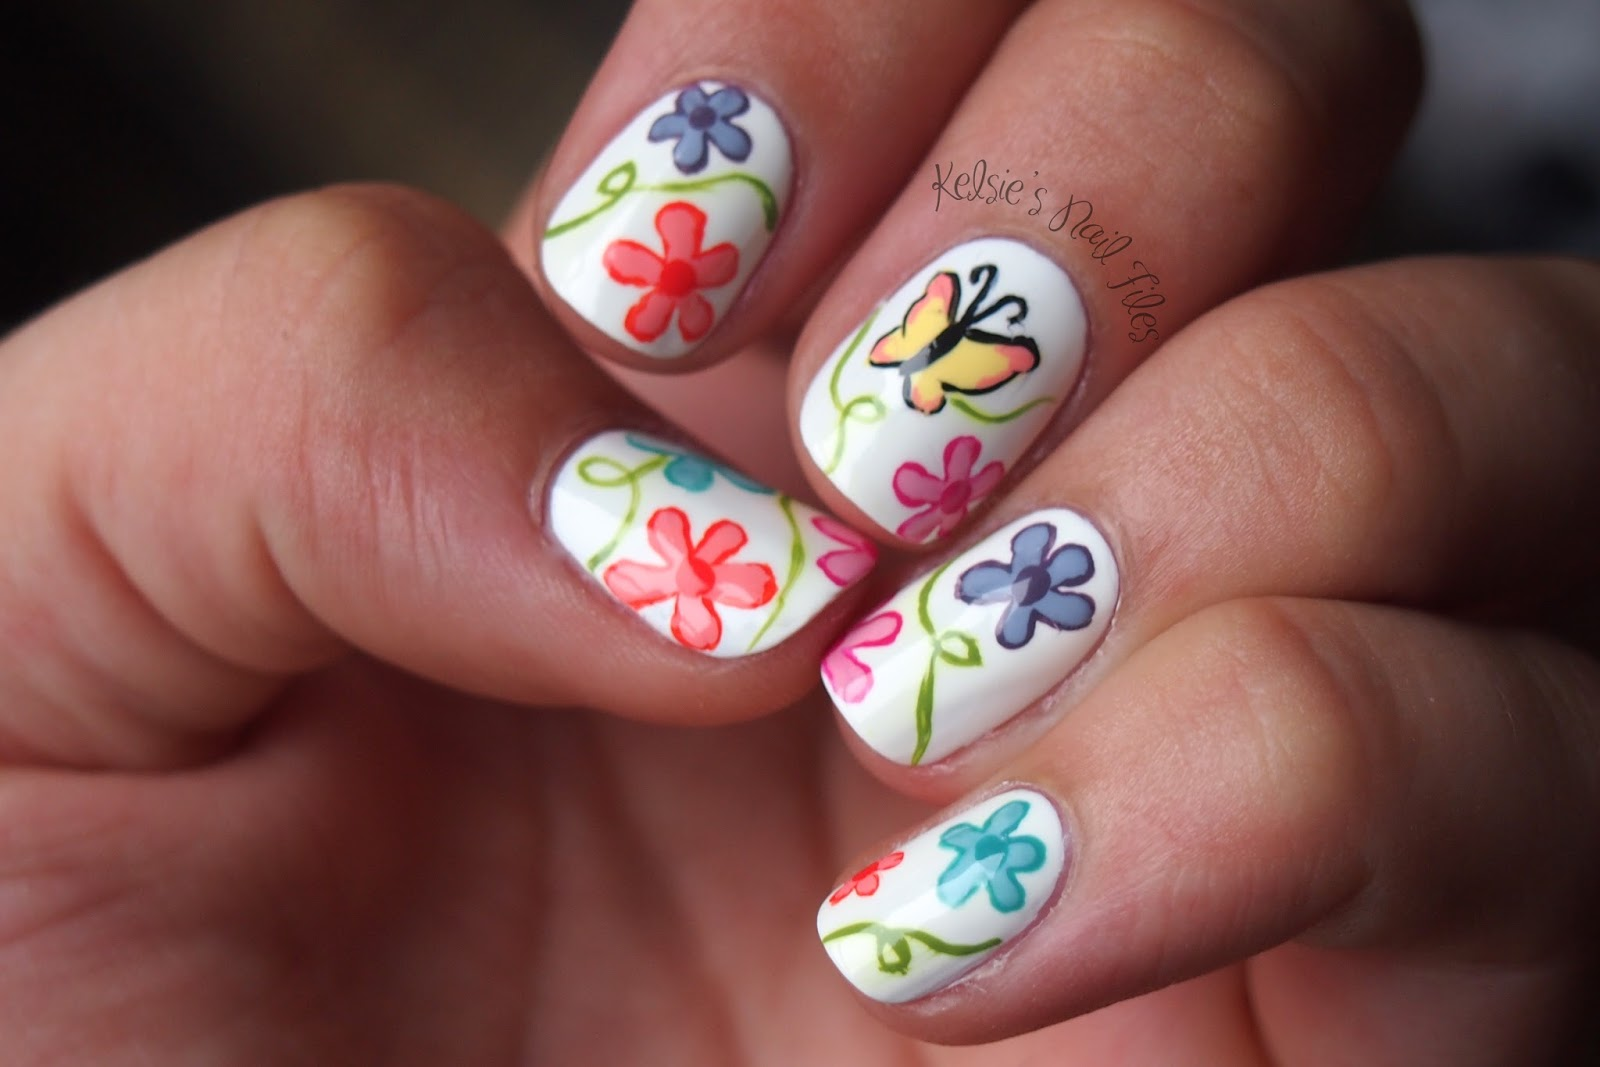 Kelsies nail files review born pretty store boan nail art brush prinsesfo Gallery